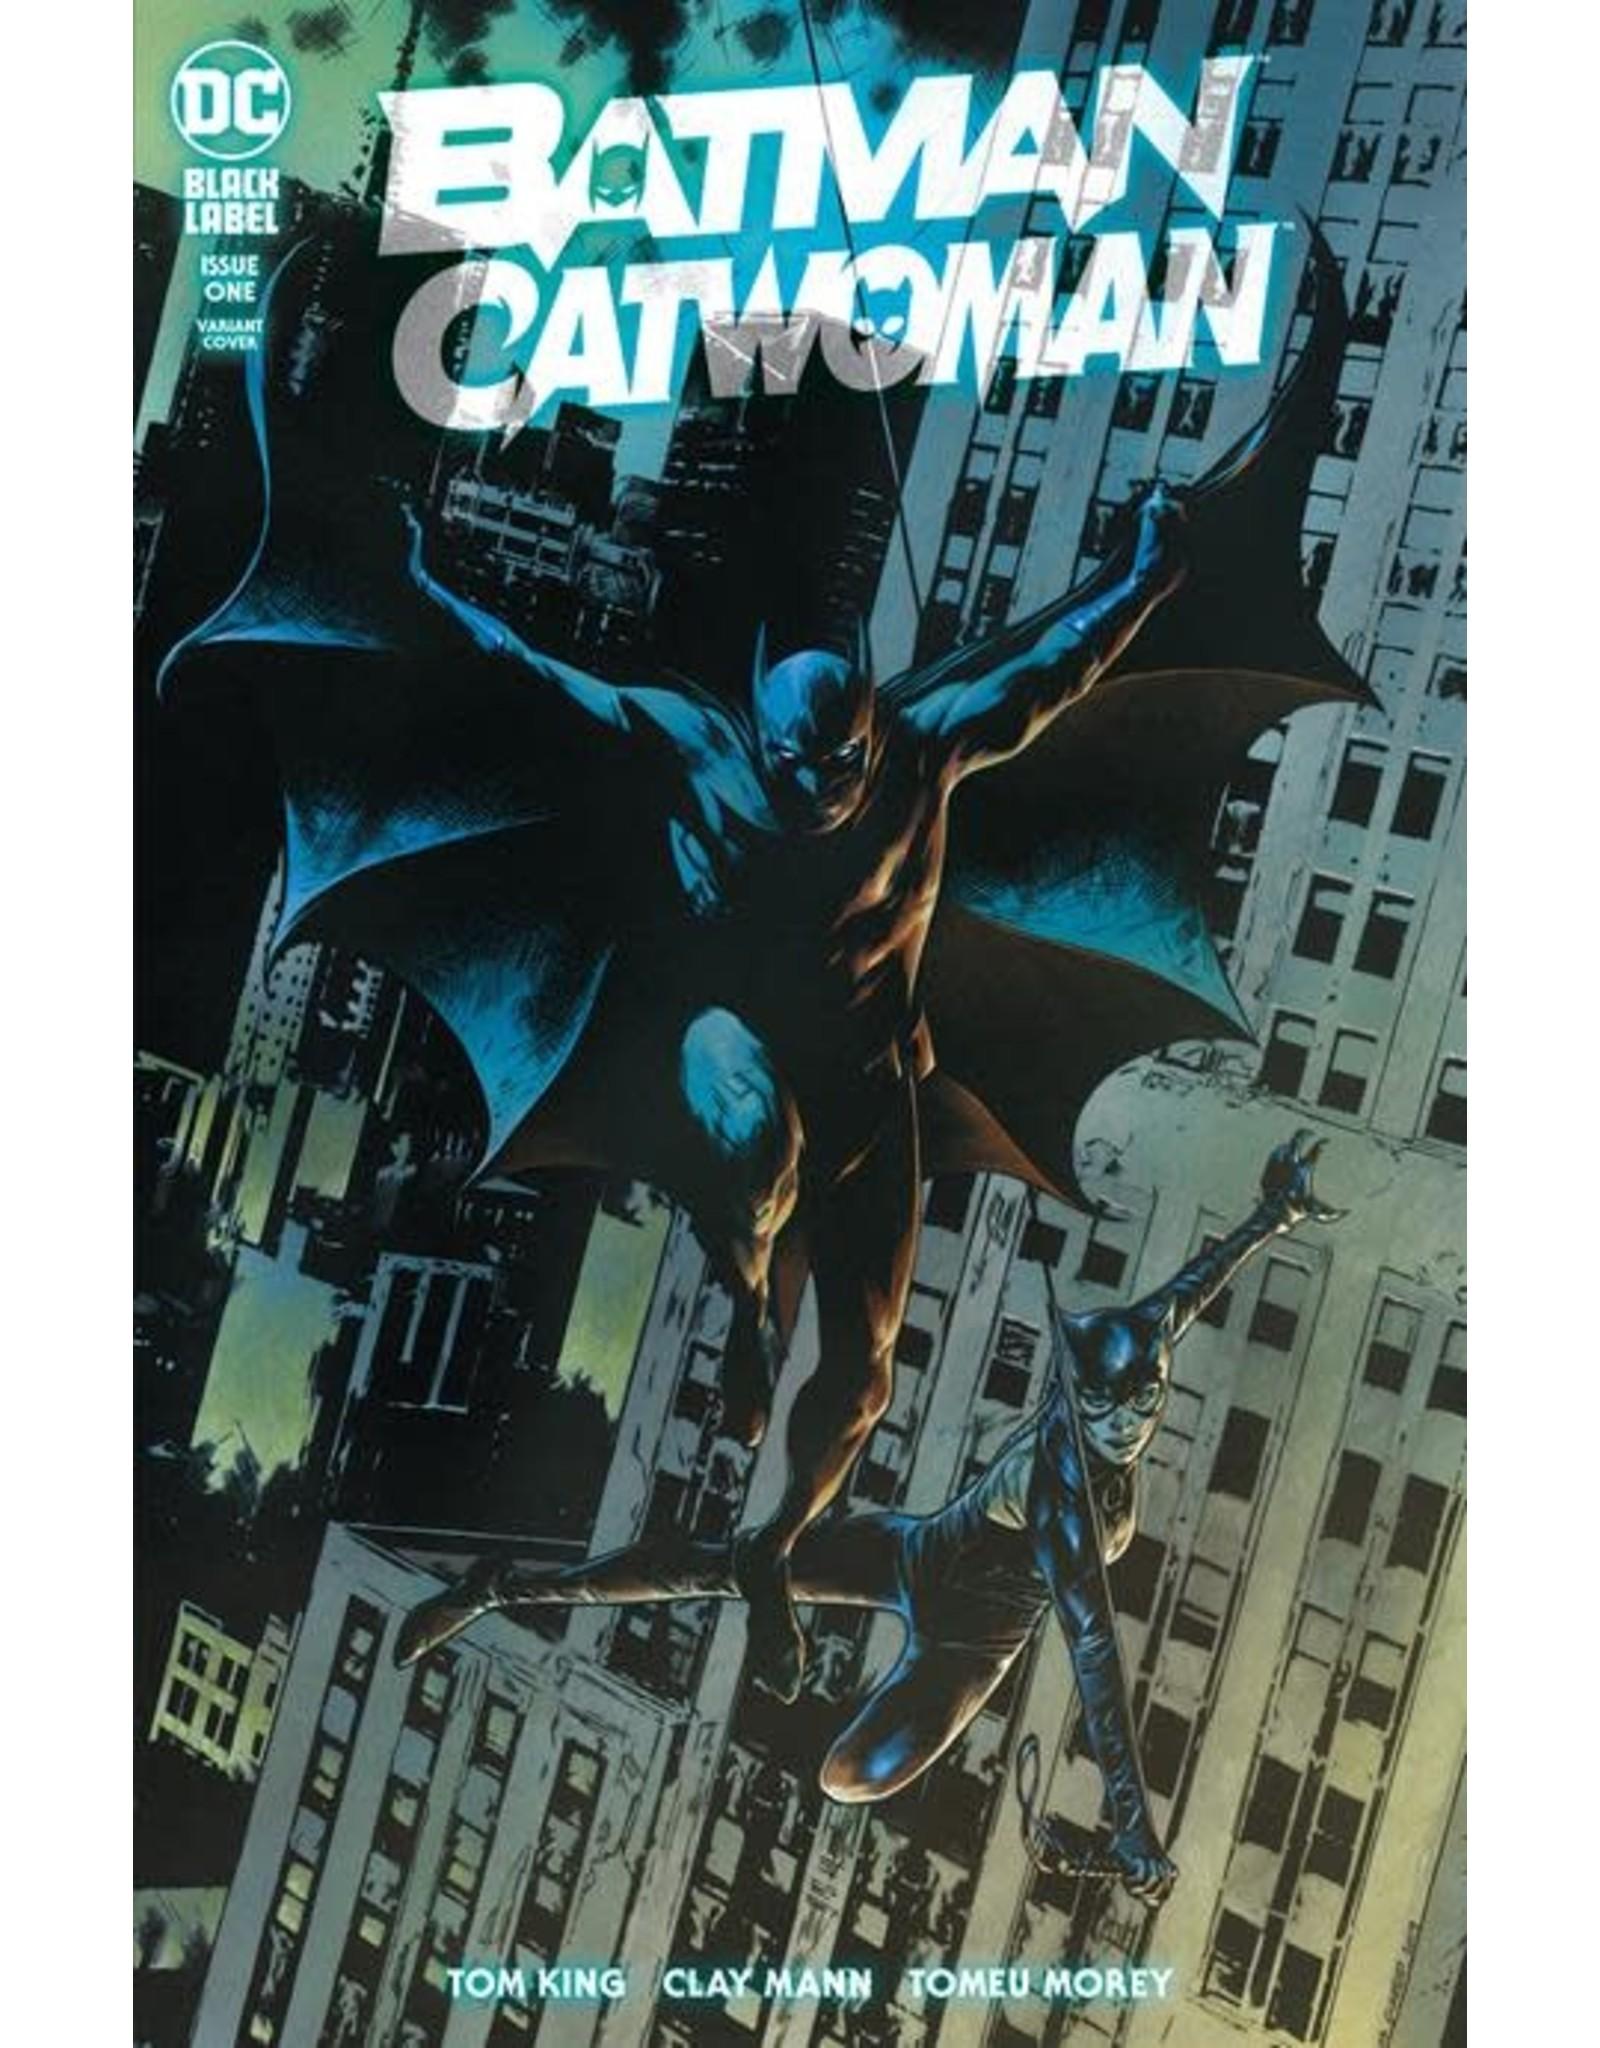 DC Comics BATMAN CATWOMAN #1 (OF 12) CVR C TRAVIS CHAREST VAR